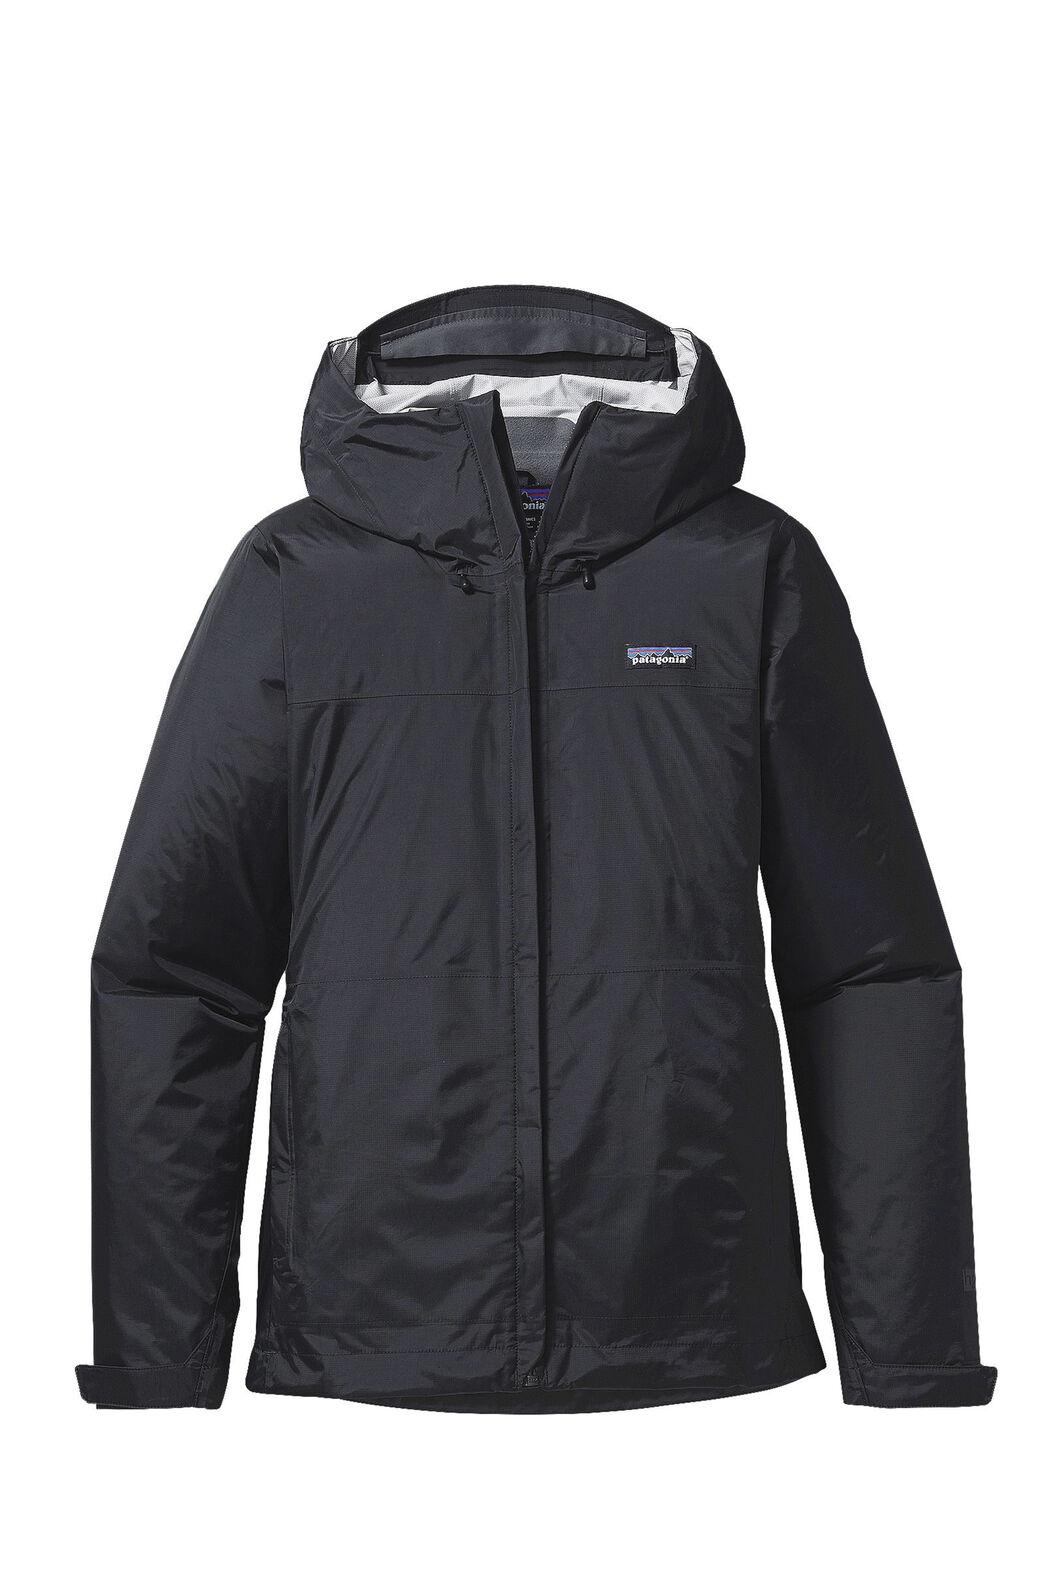 Patagonia Women's Torrentshell Jacket, Black, hi-res